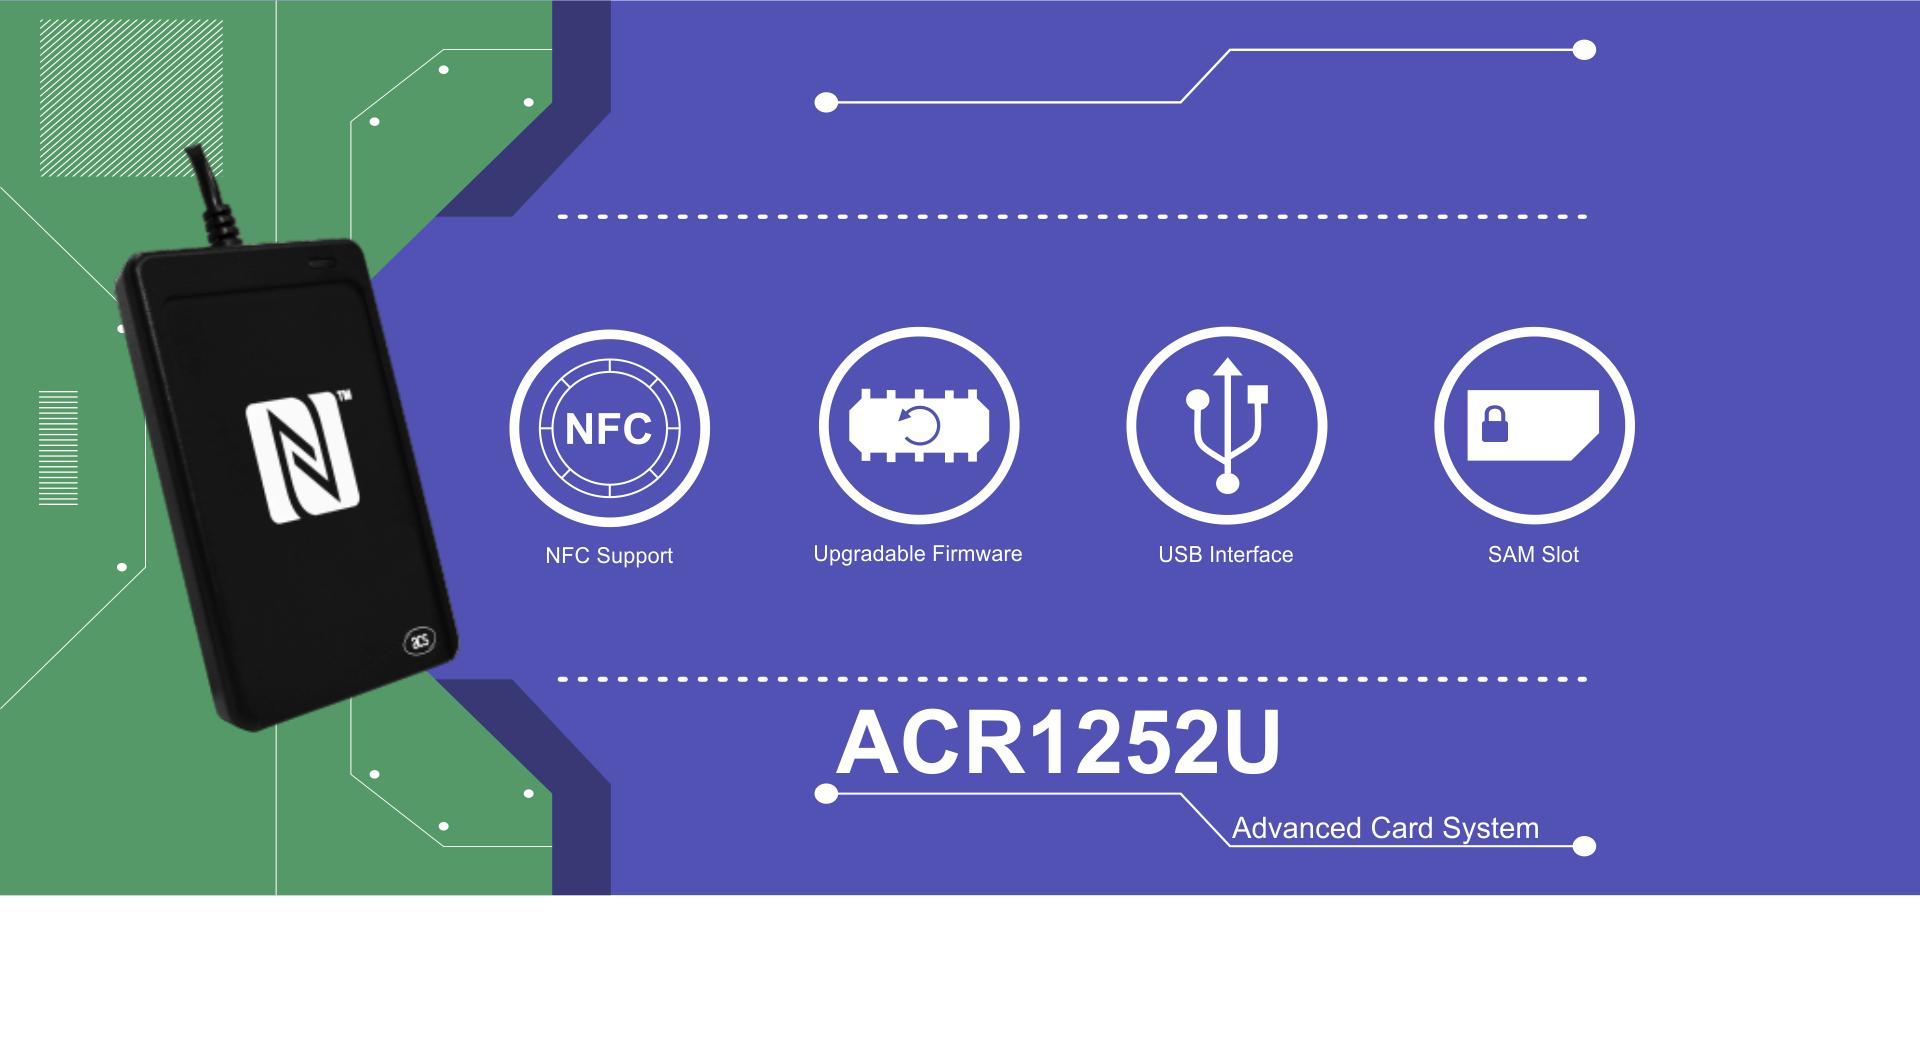 ACR1252U